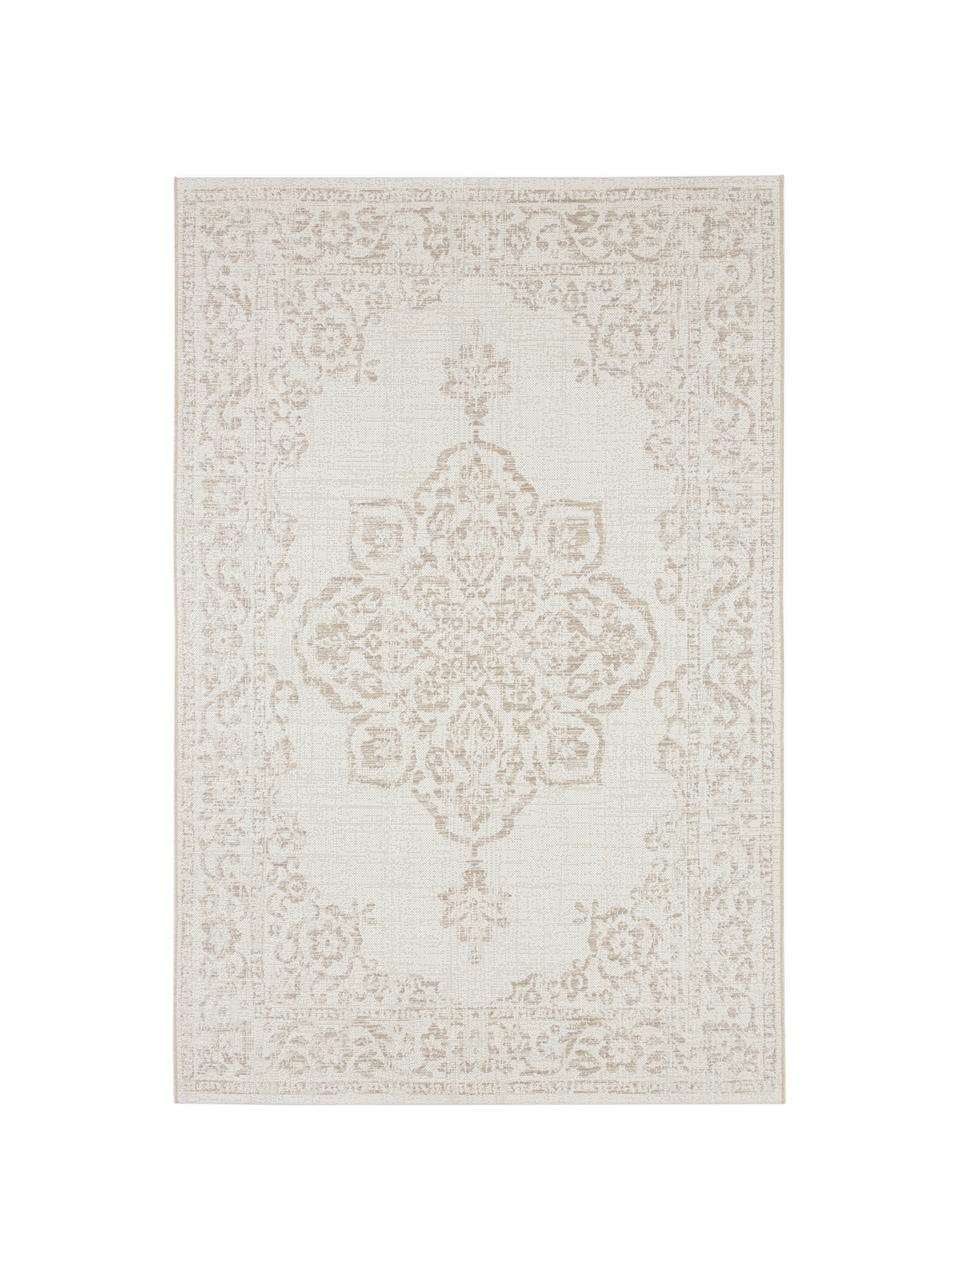 Tappeto vintage da interno-esterno Tilos, Polipropilene, Crema, beige, Larg.160 x Lung. 230 cm (taglia M)